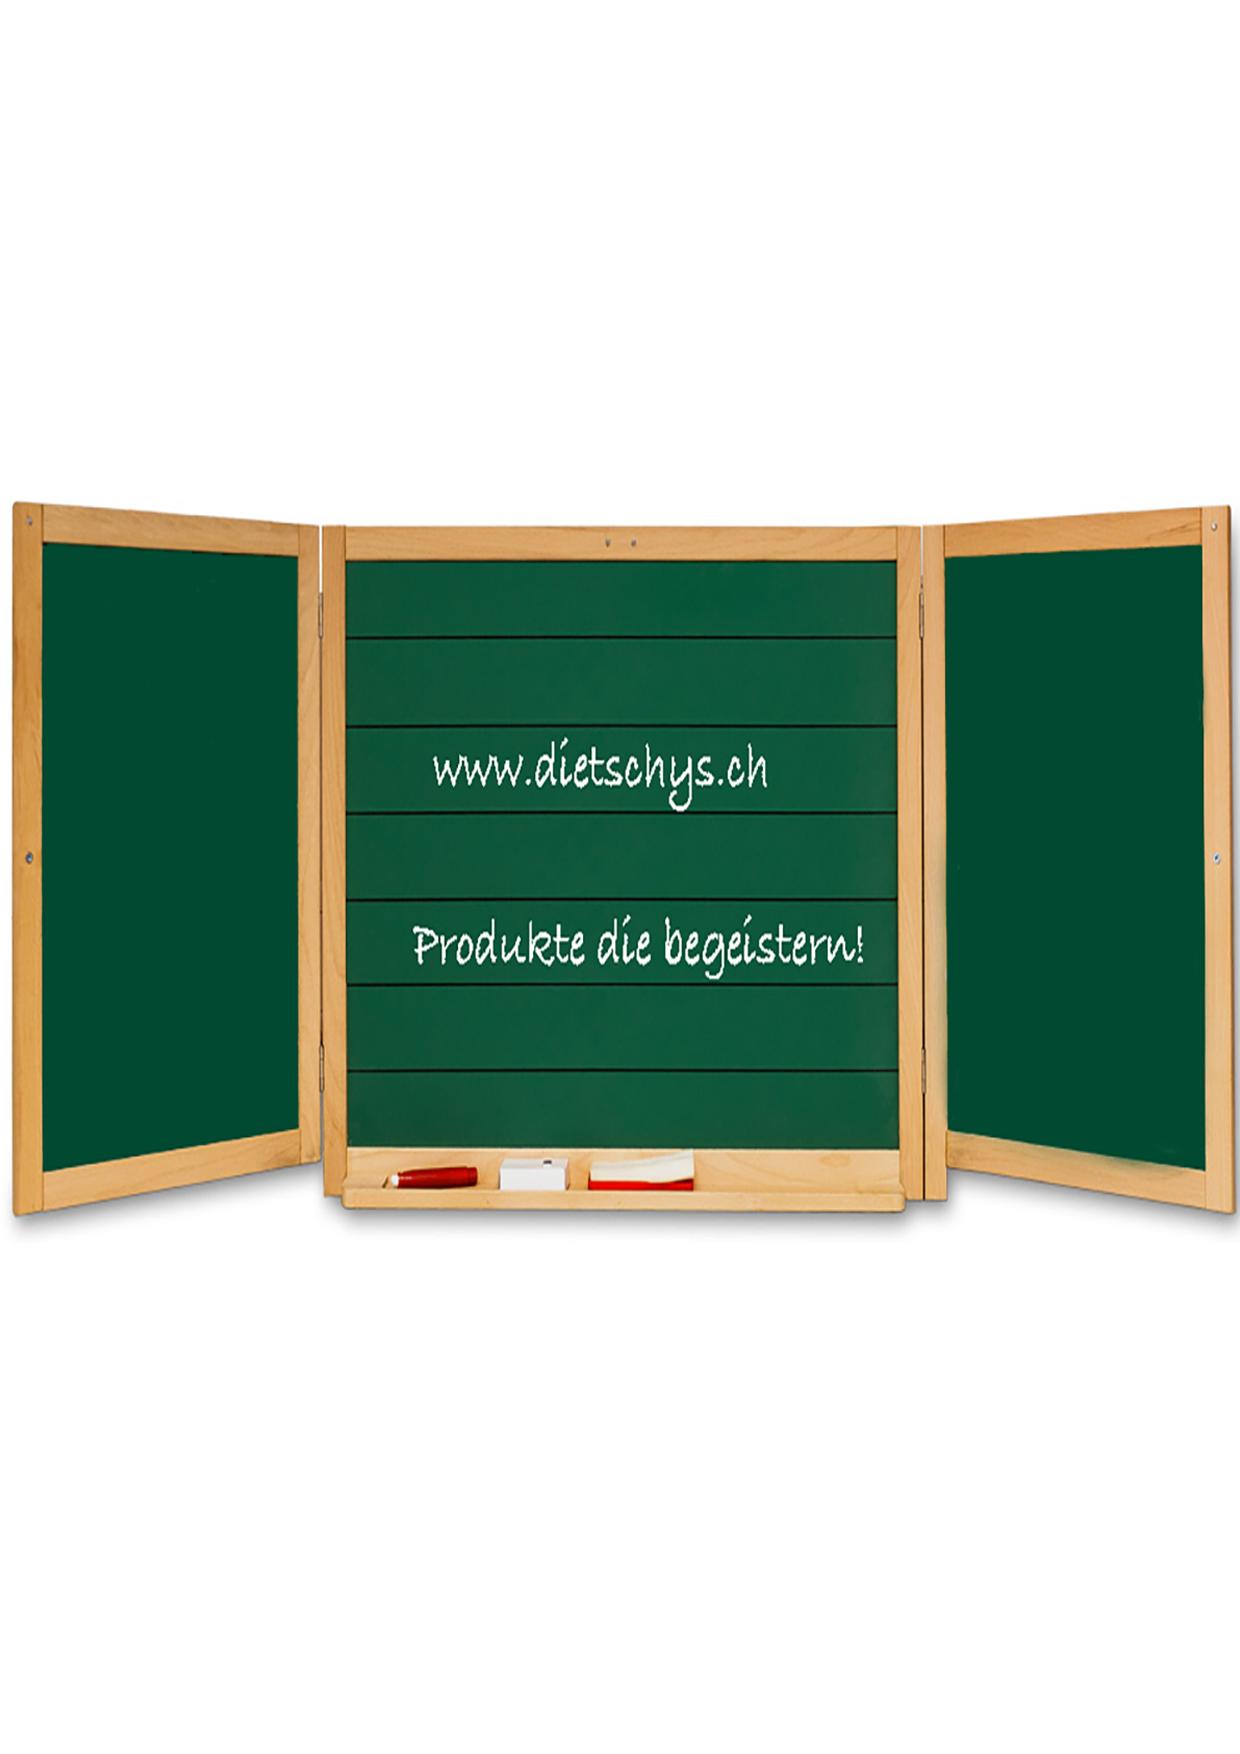 wandtafel dietschys gmbh. Black Bedroom Furniture Sets. Home Design Ideas